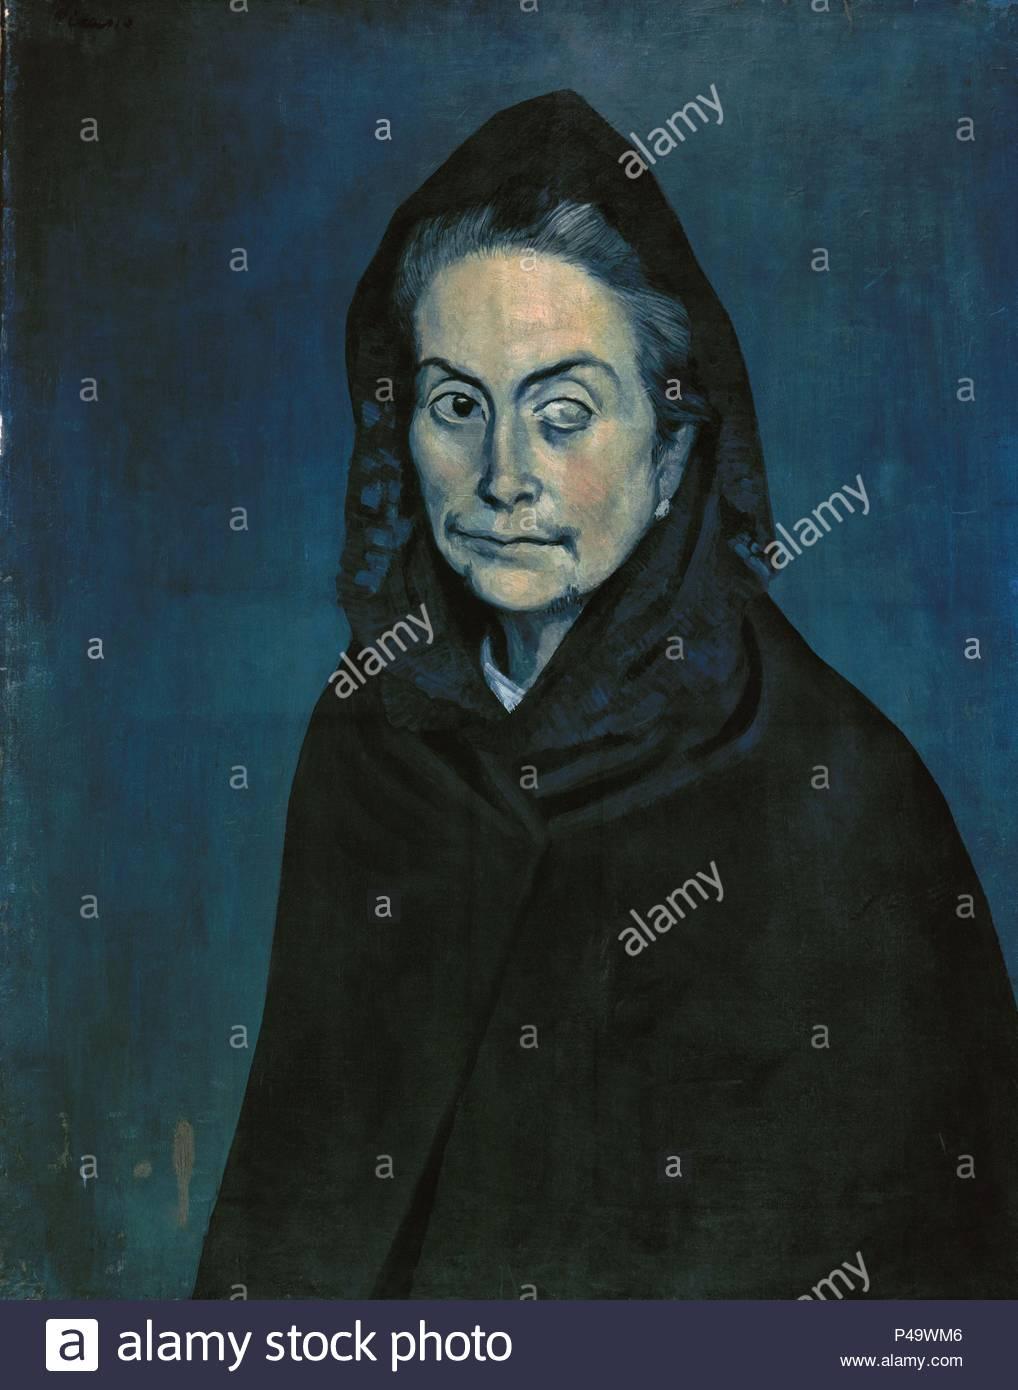 Spanish school. La Celestina . 1903. Blue Period. Oil on canvas (0.81 x 0.60 m). Paris, Private collection. Author: Pablo Picasso (1881-1973). Location: PRIVATE COLLECTION, FRANCE. - Stock Image